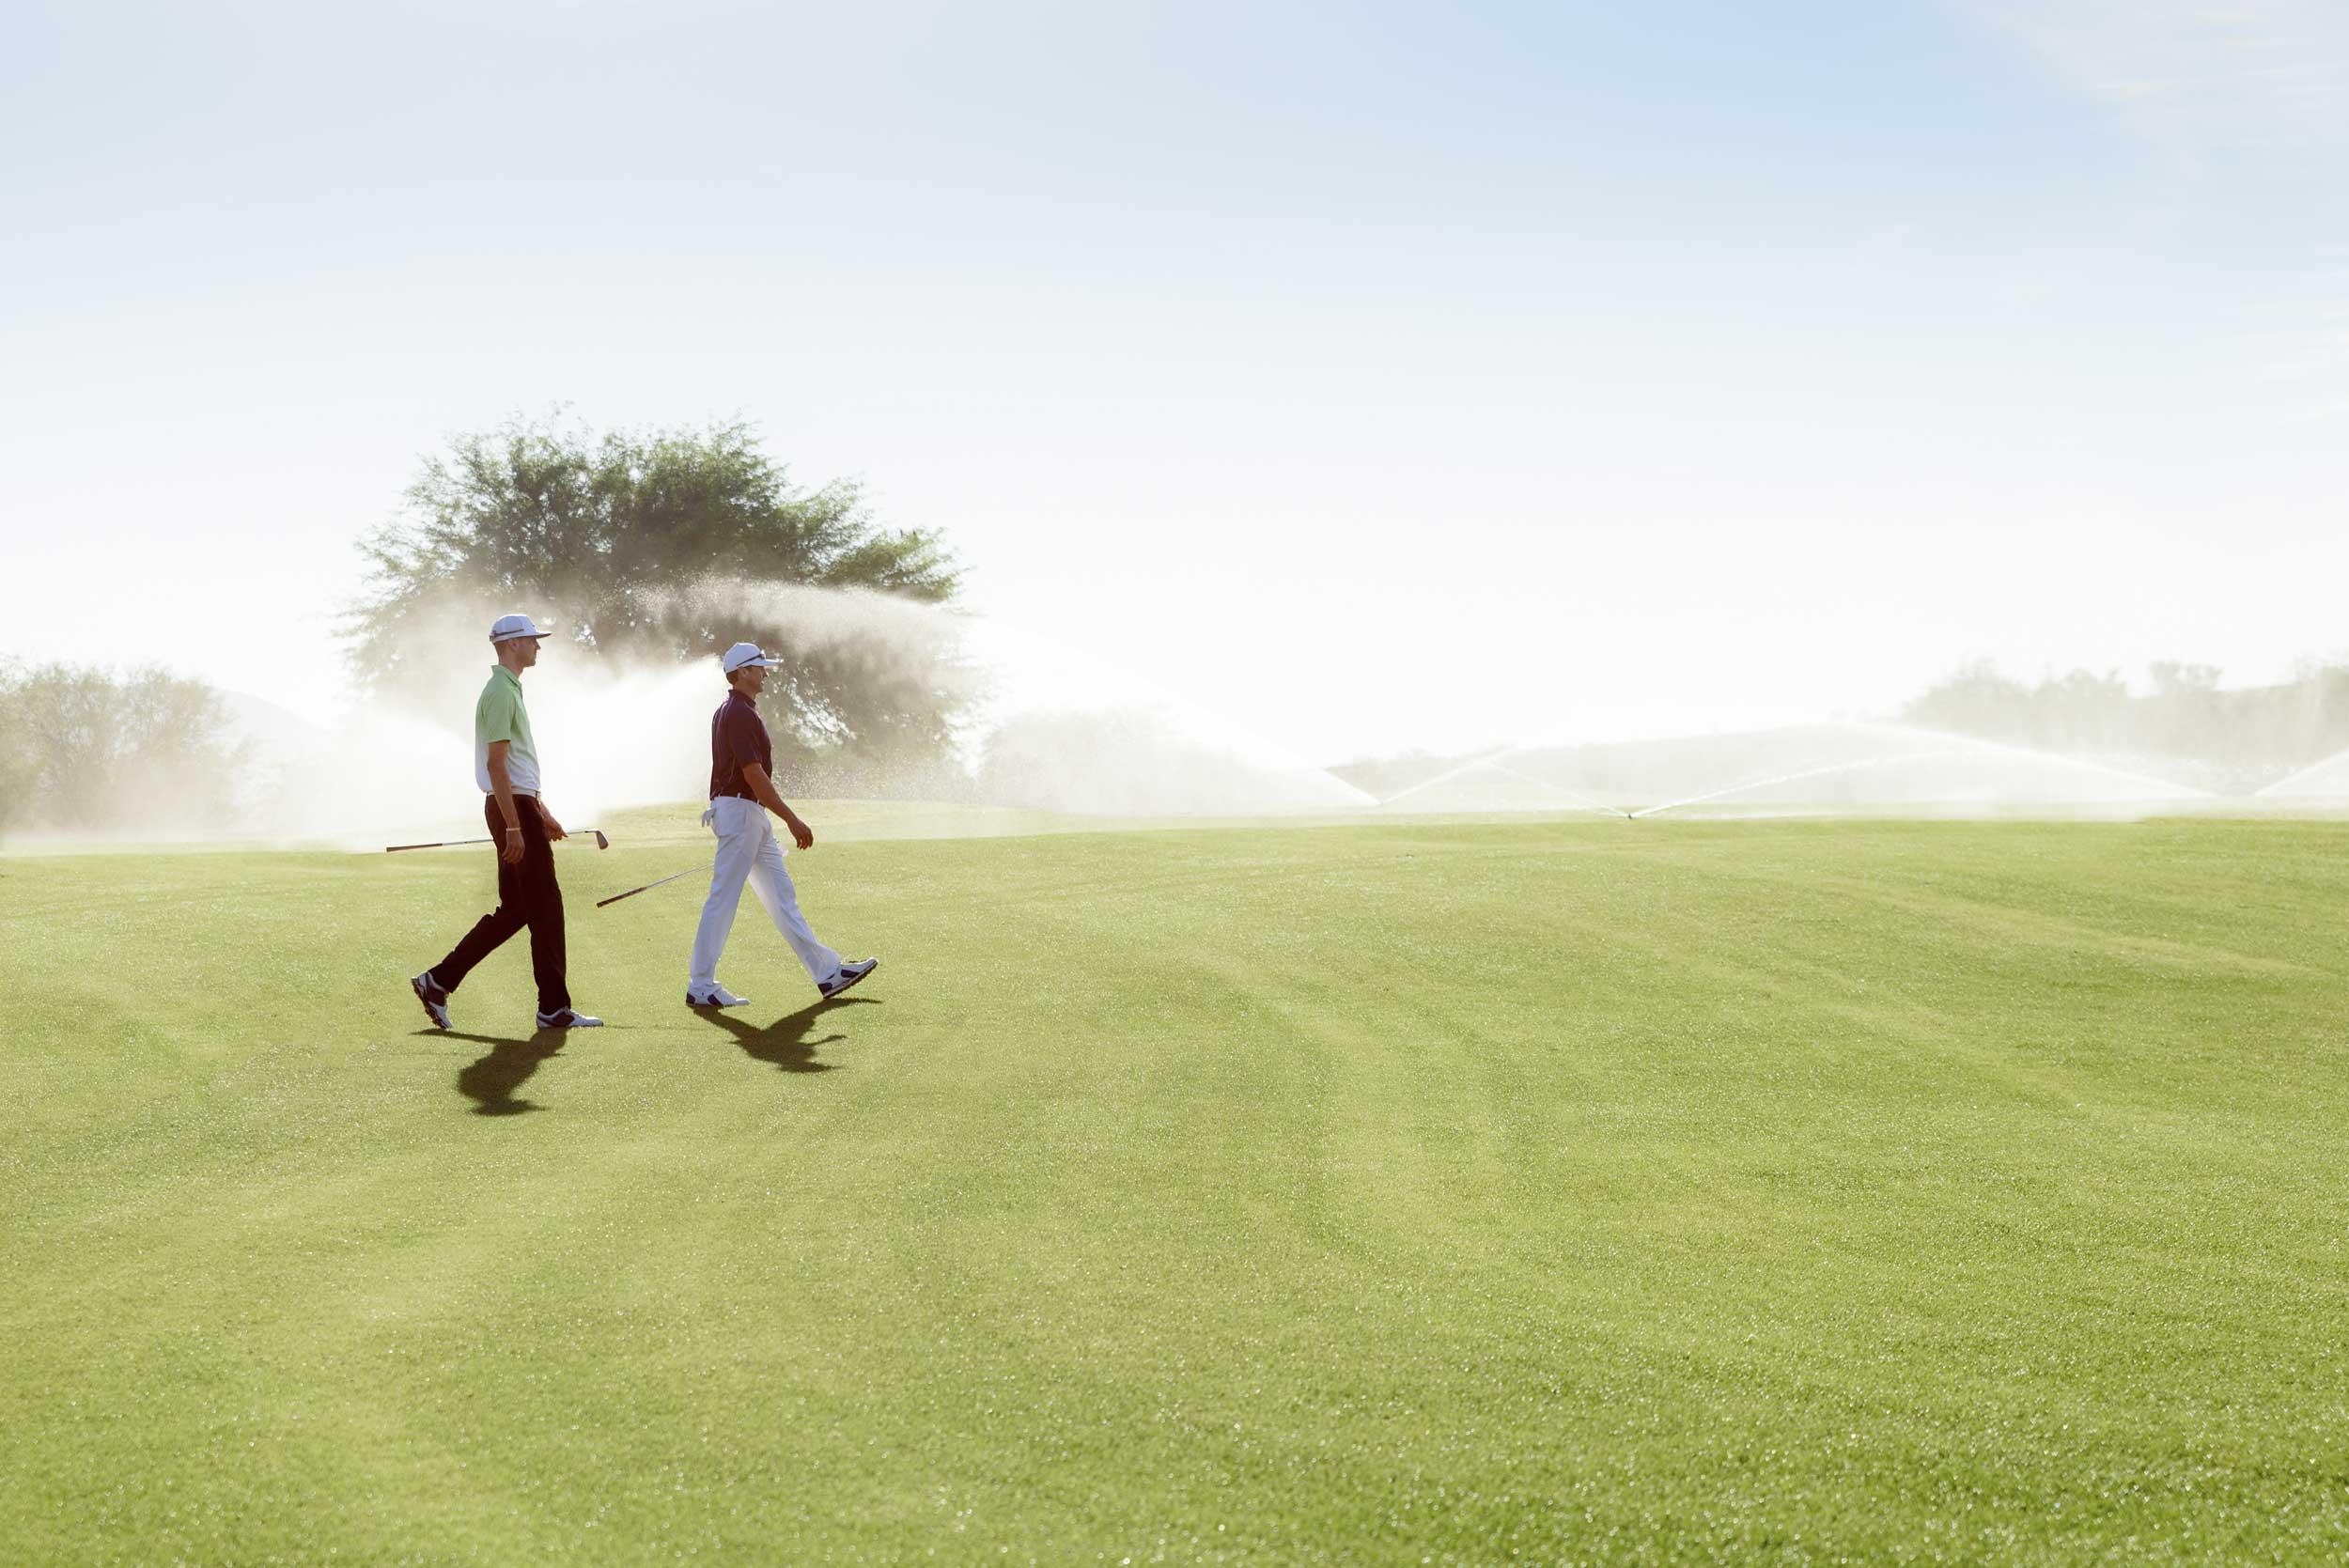 golf_LemonsCottage_main-opti.jpg